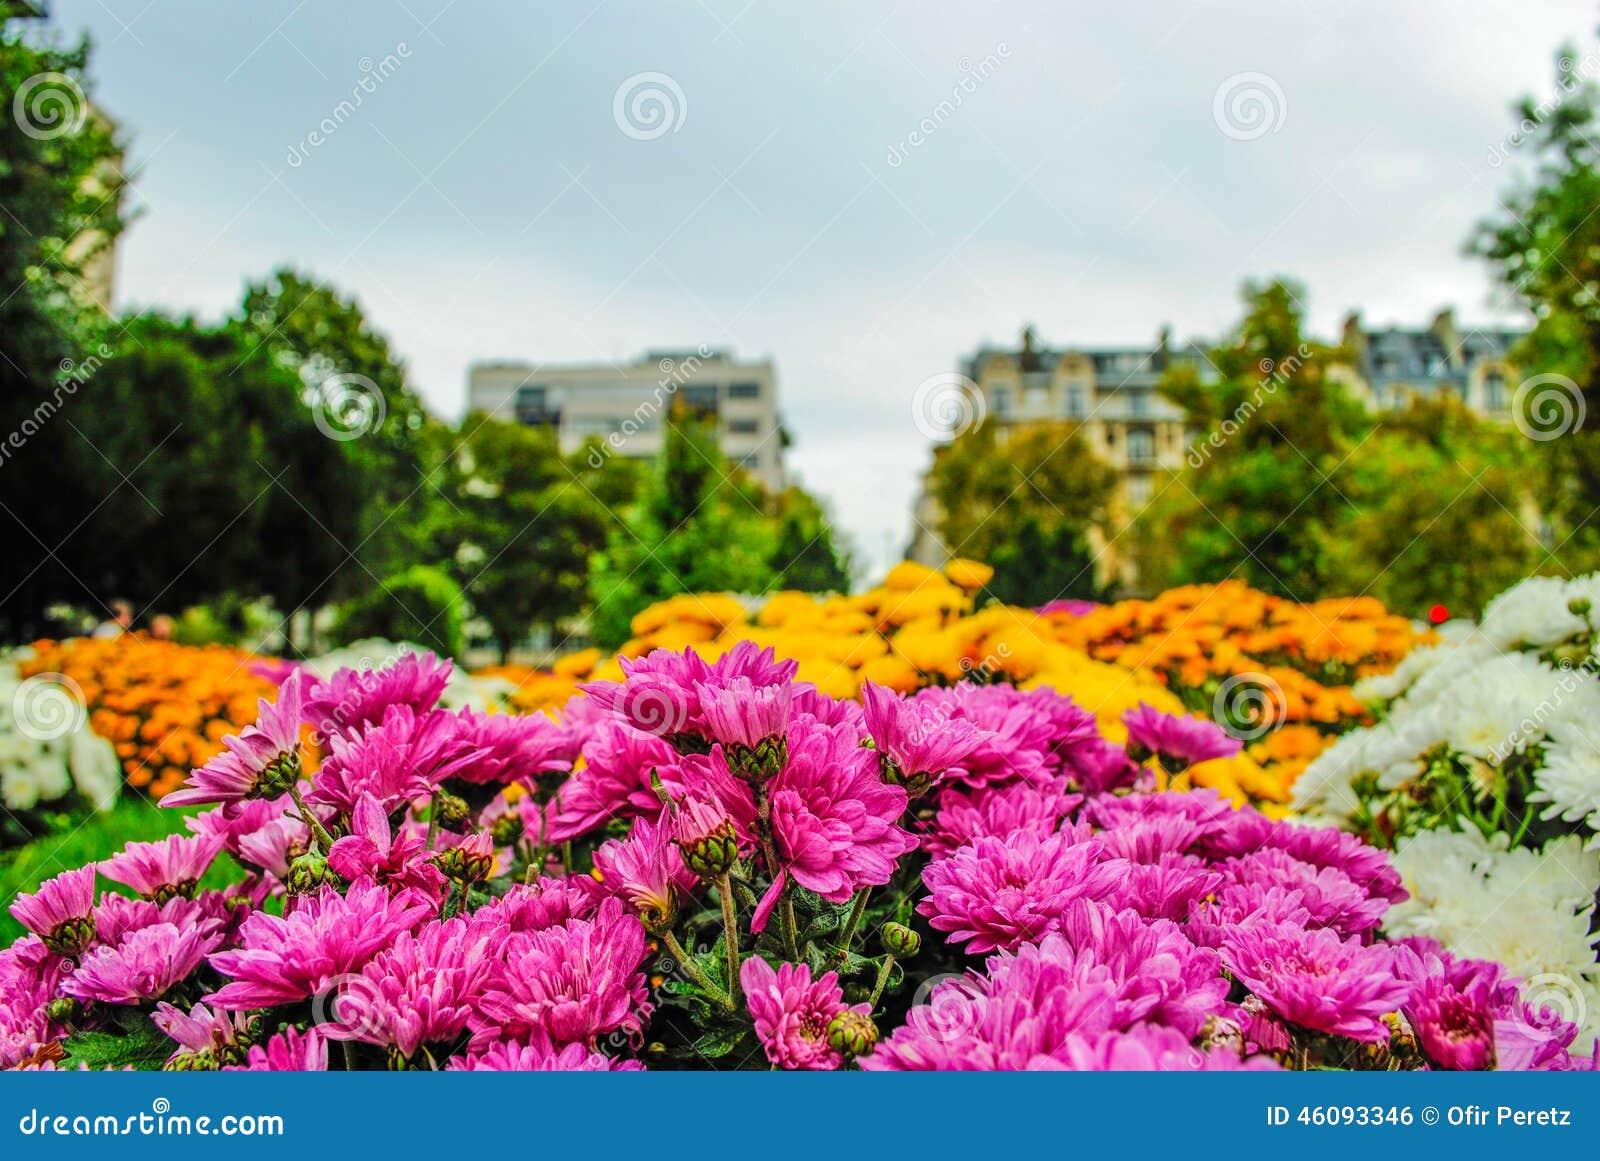 Beautiful Flowers Flowers At A Parisian Garden Stock Photo ...